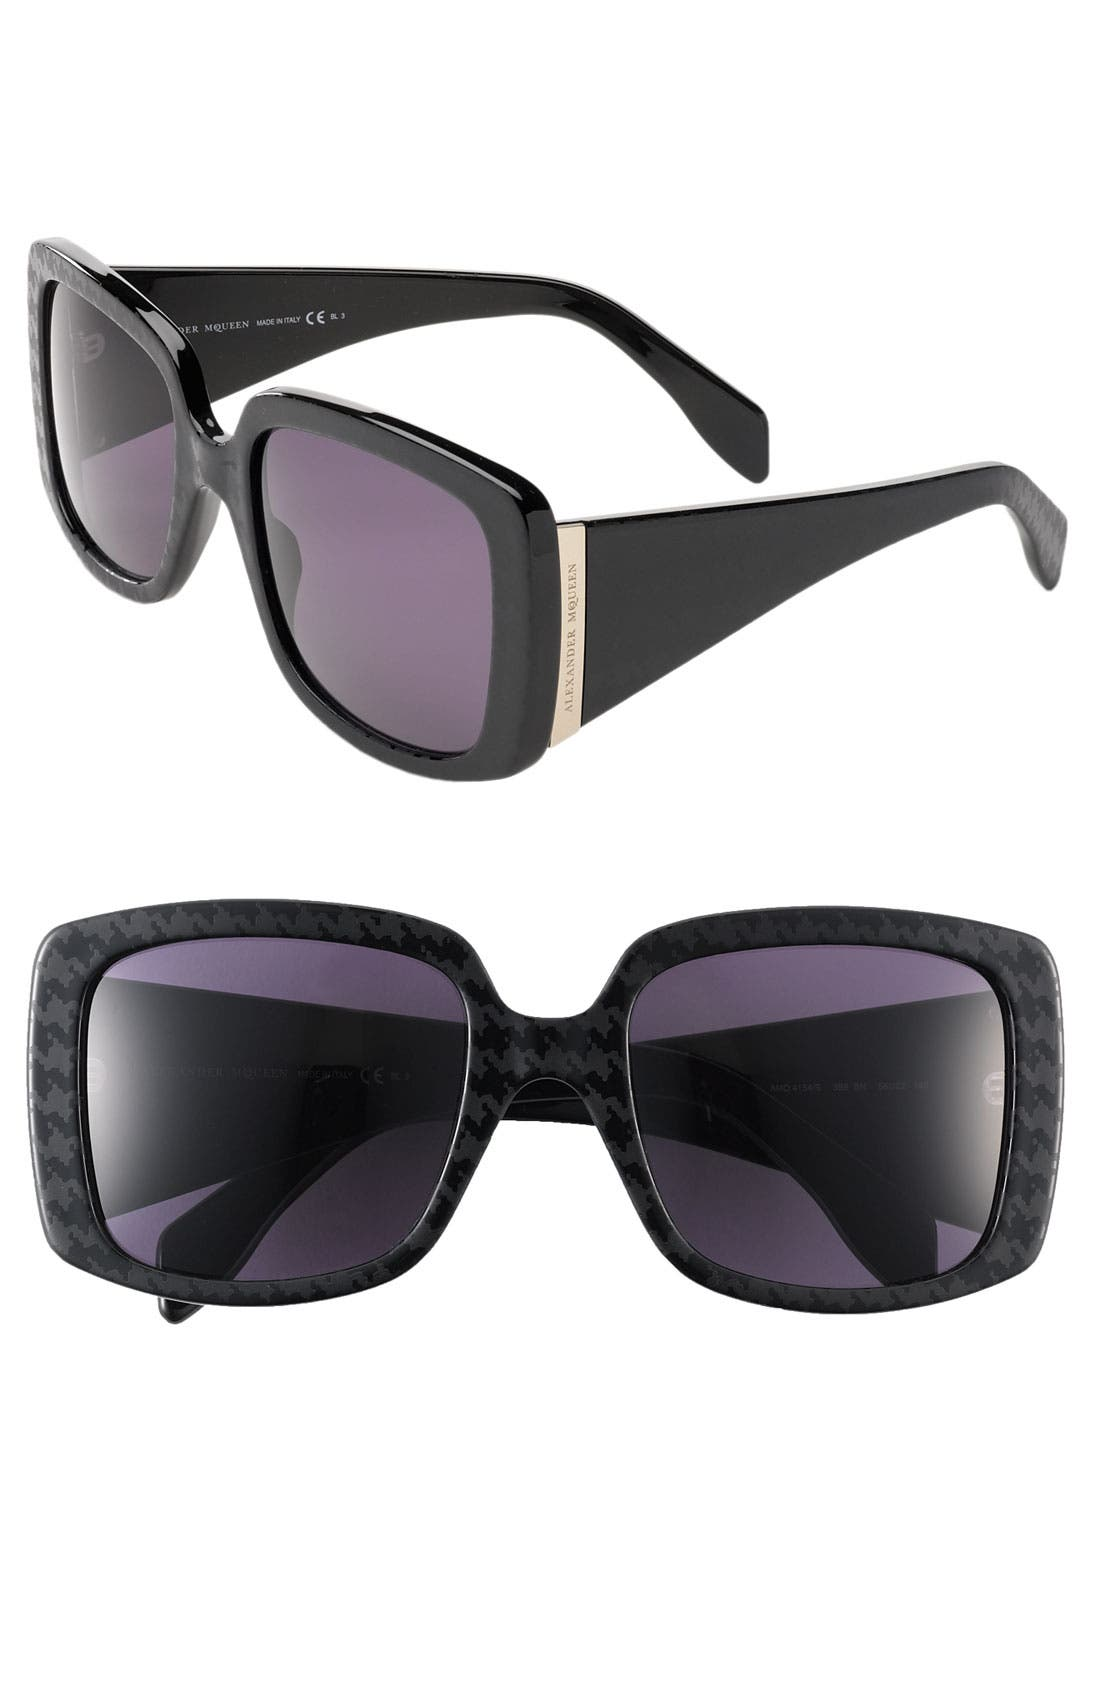 Main Image - Alexander McQueen Oversized Square Sunglasses